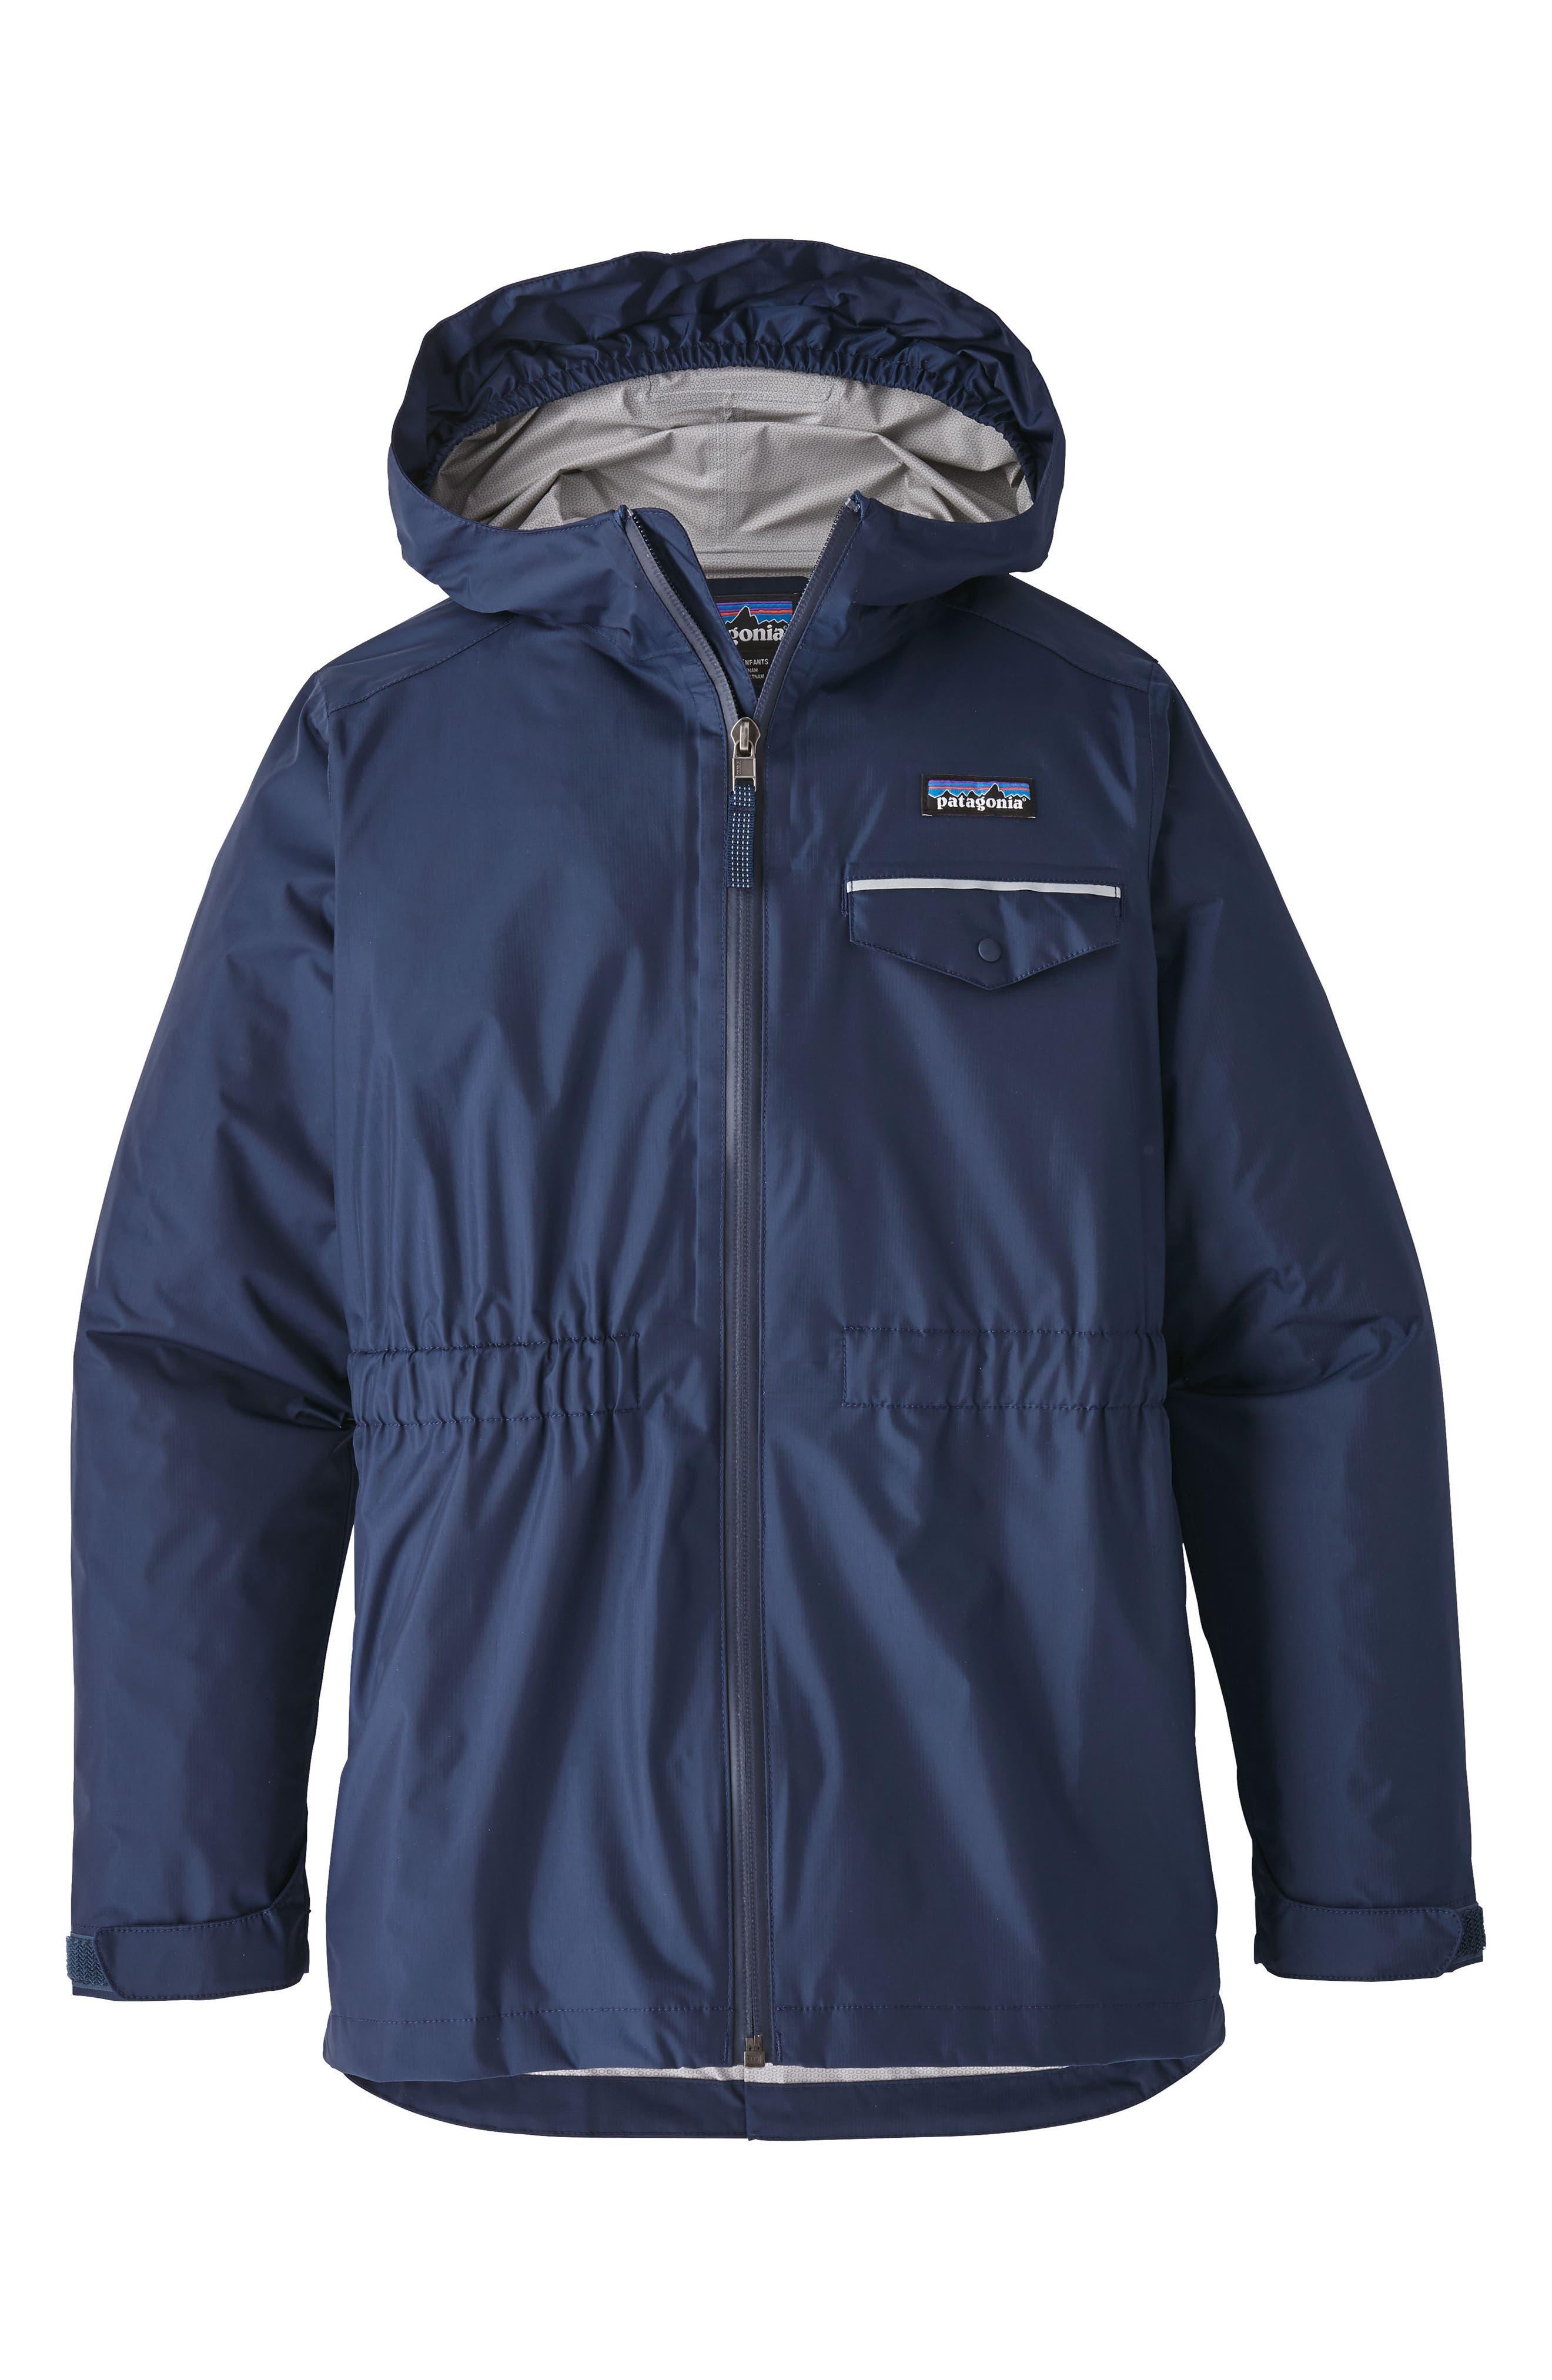 Girls Patagonia Torrentshell Jacket Size XL (14)  Blue